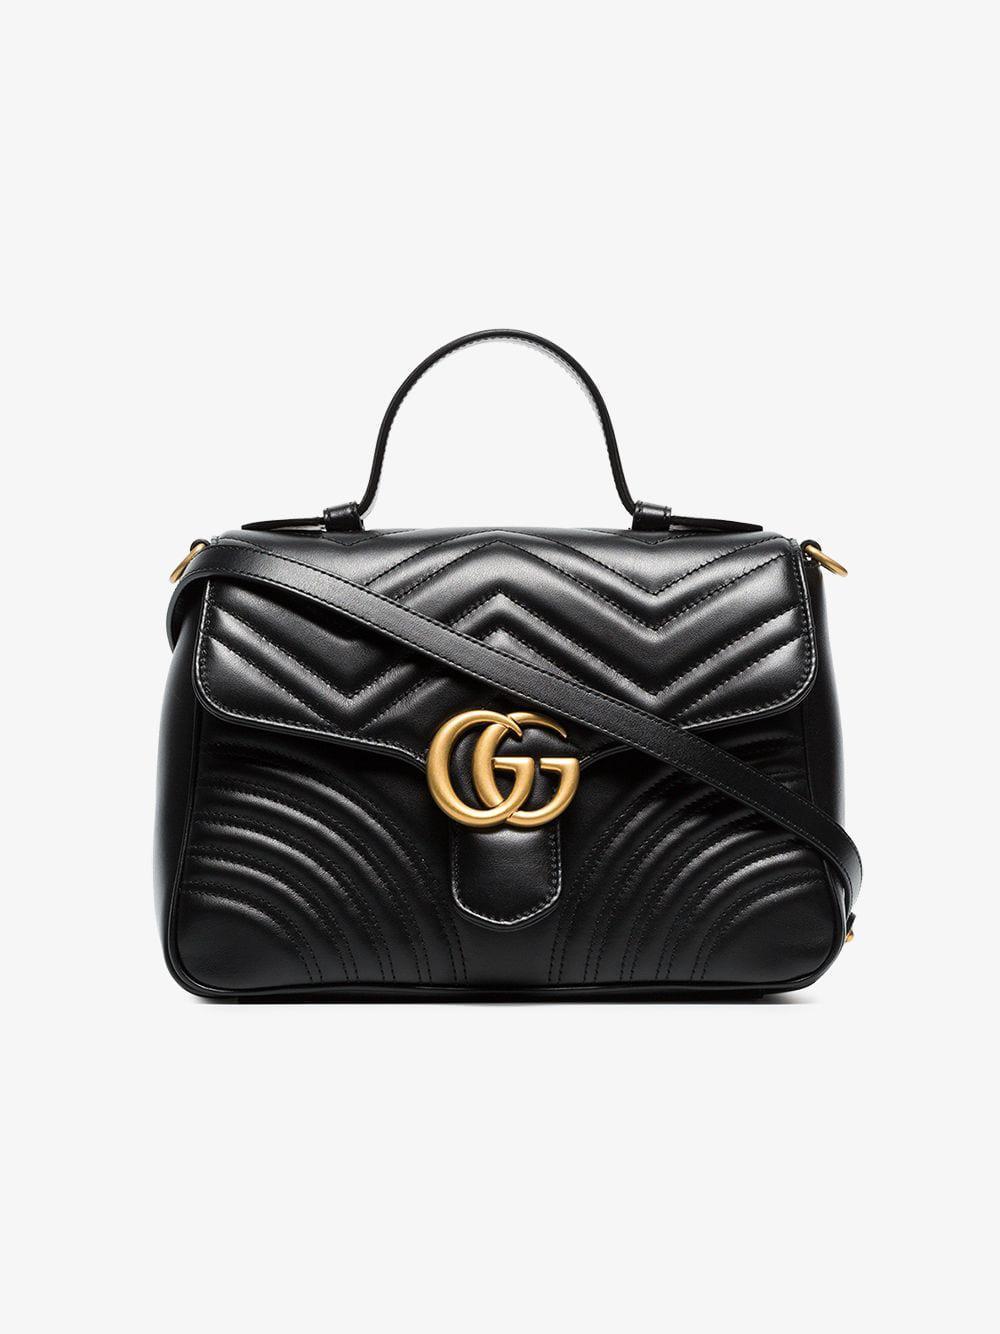 Gucci - Black GG Marmont Small Top Handle Bag - Lyst. View fullscreen 72236a4fd3e56